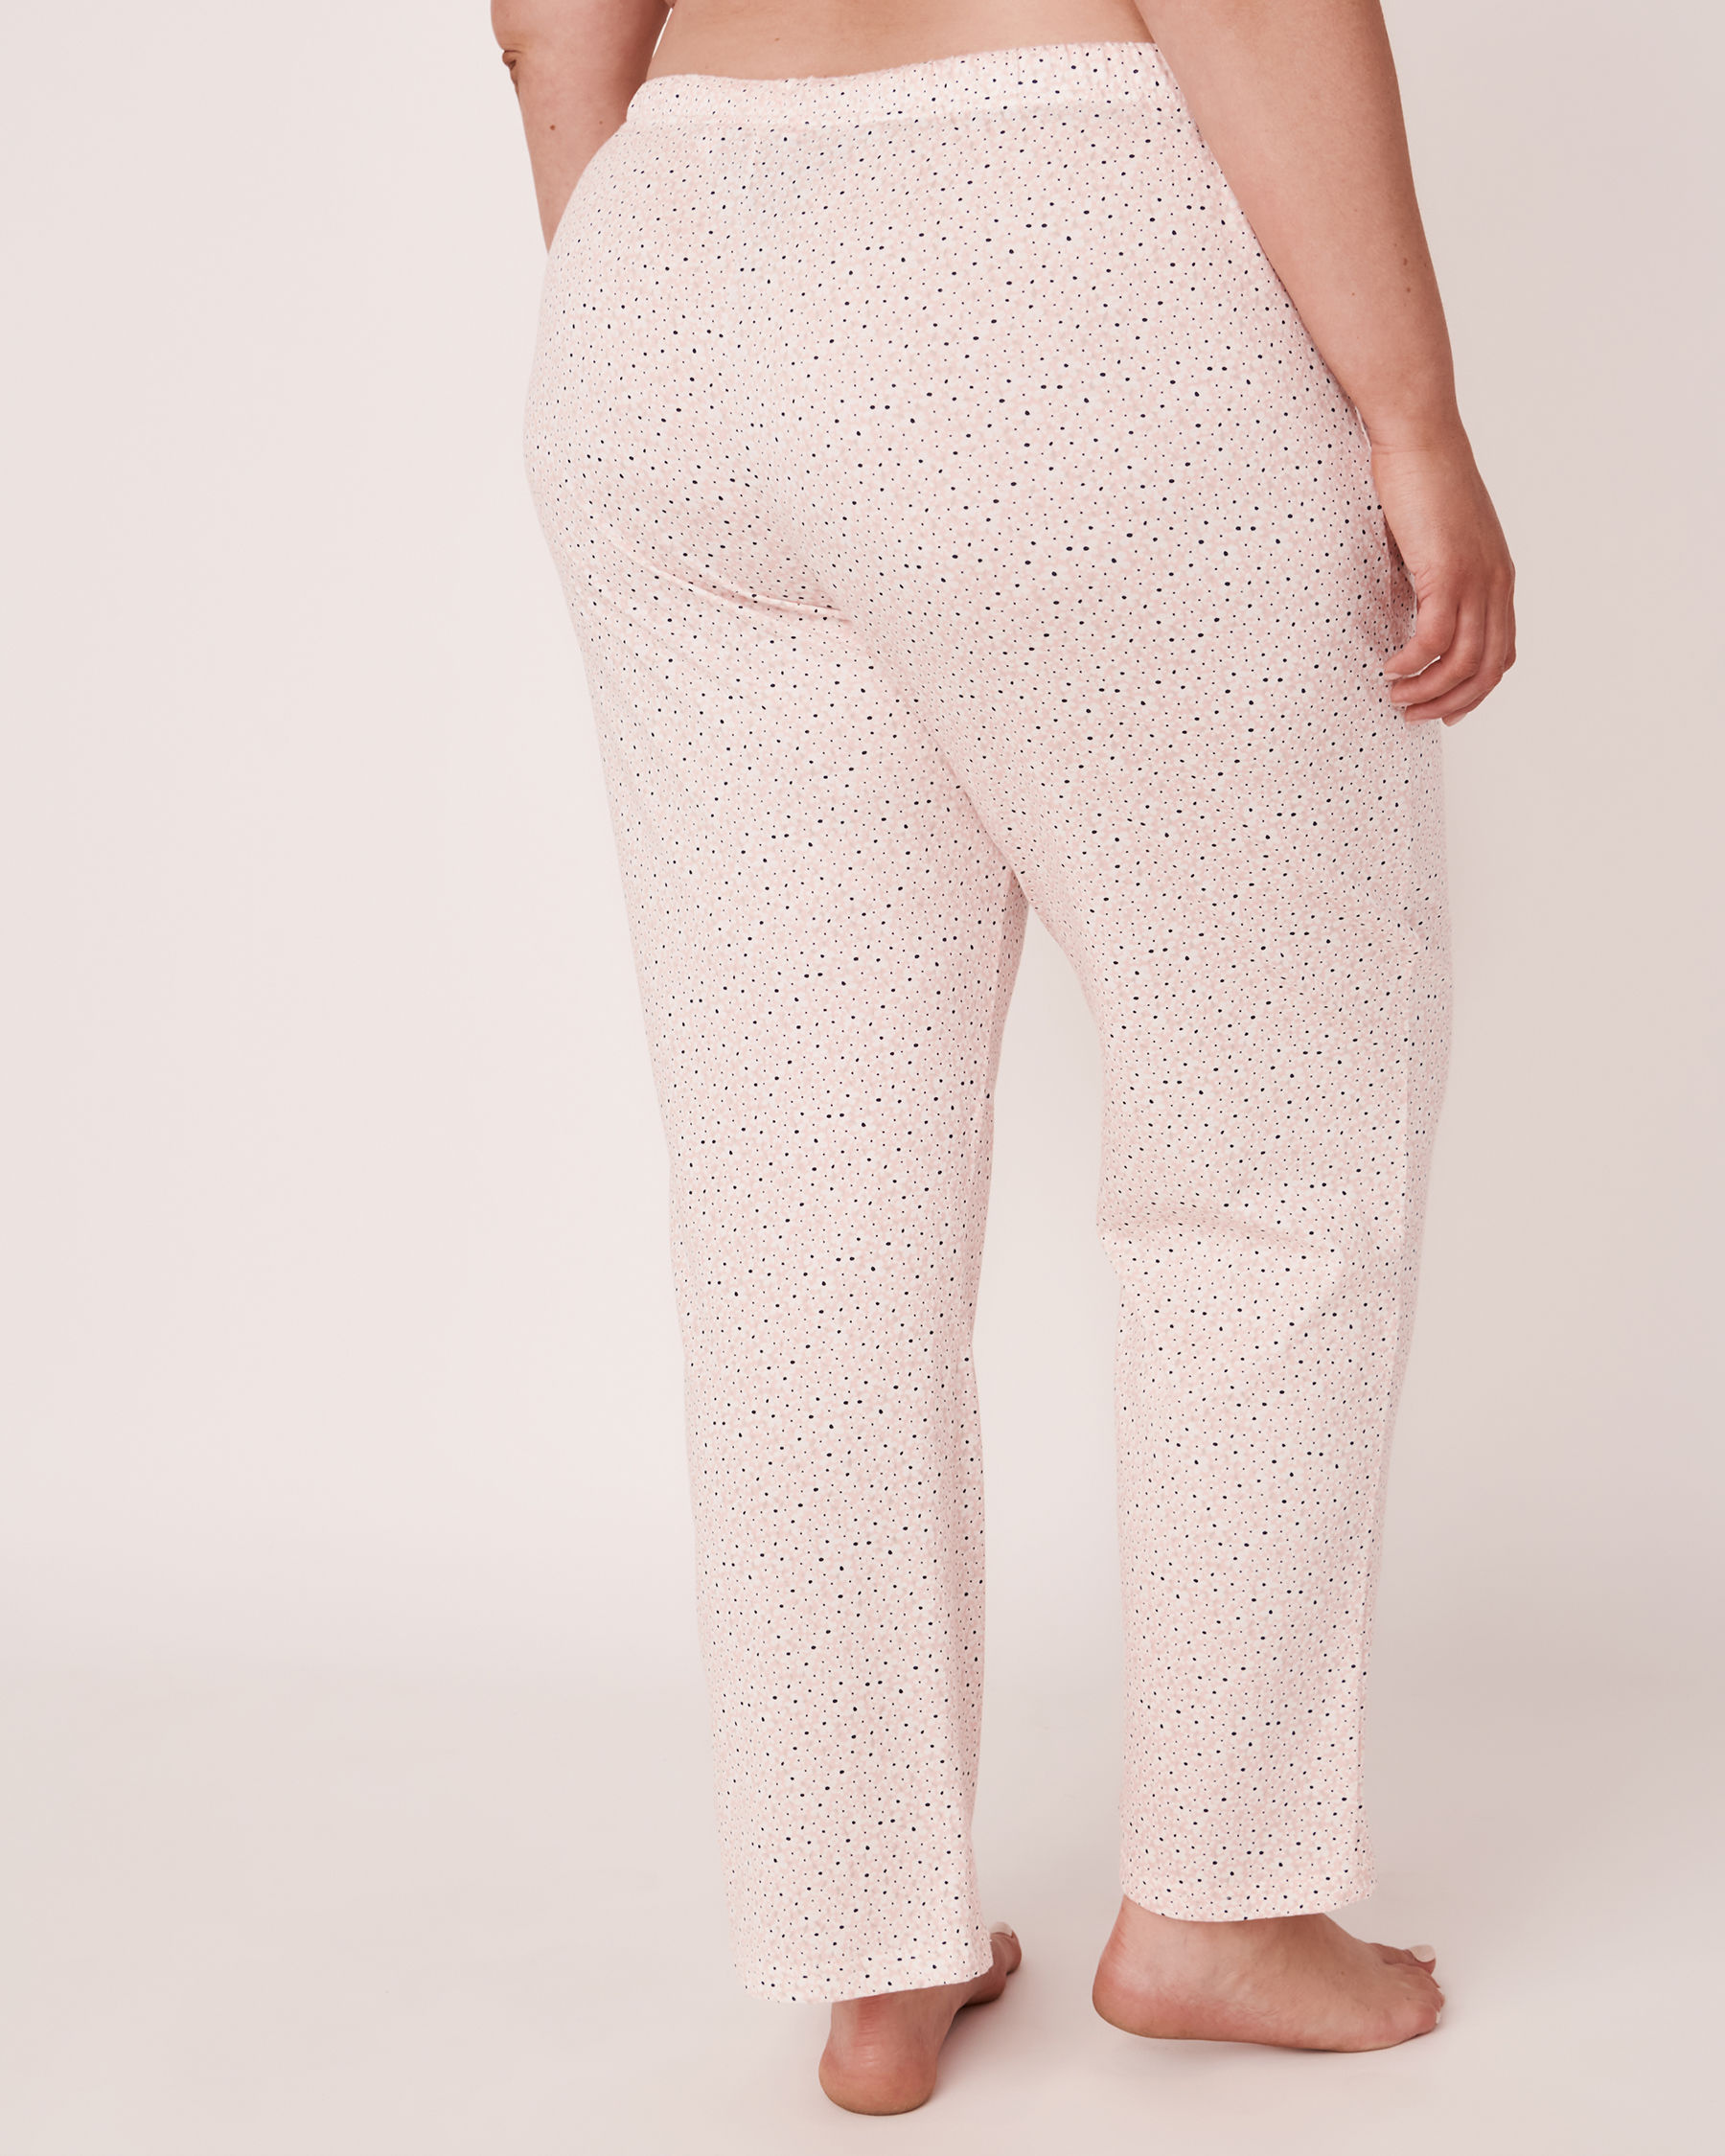 LA VIE EN ROSE Straight Leg Pyjama Pant Flowers 40200110 - View2